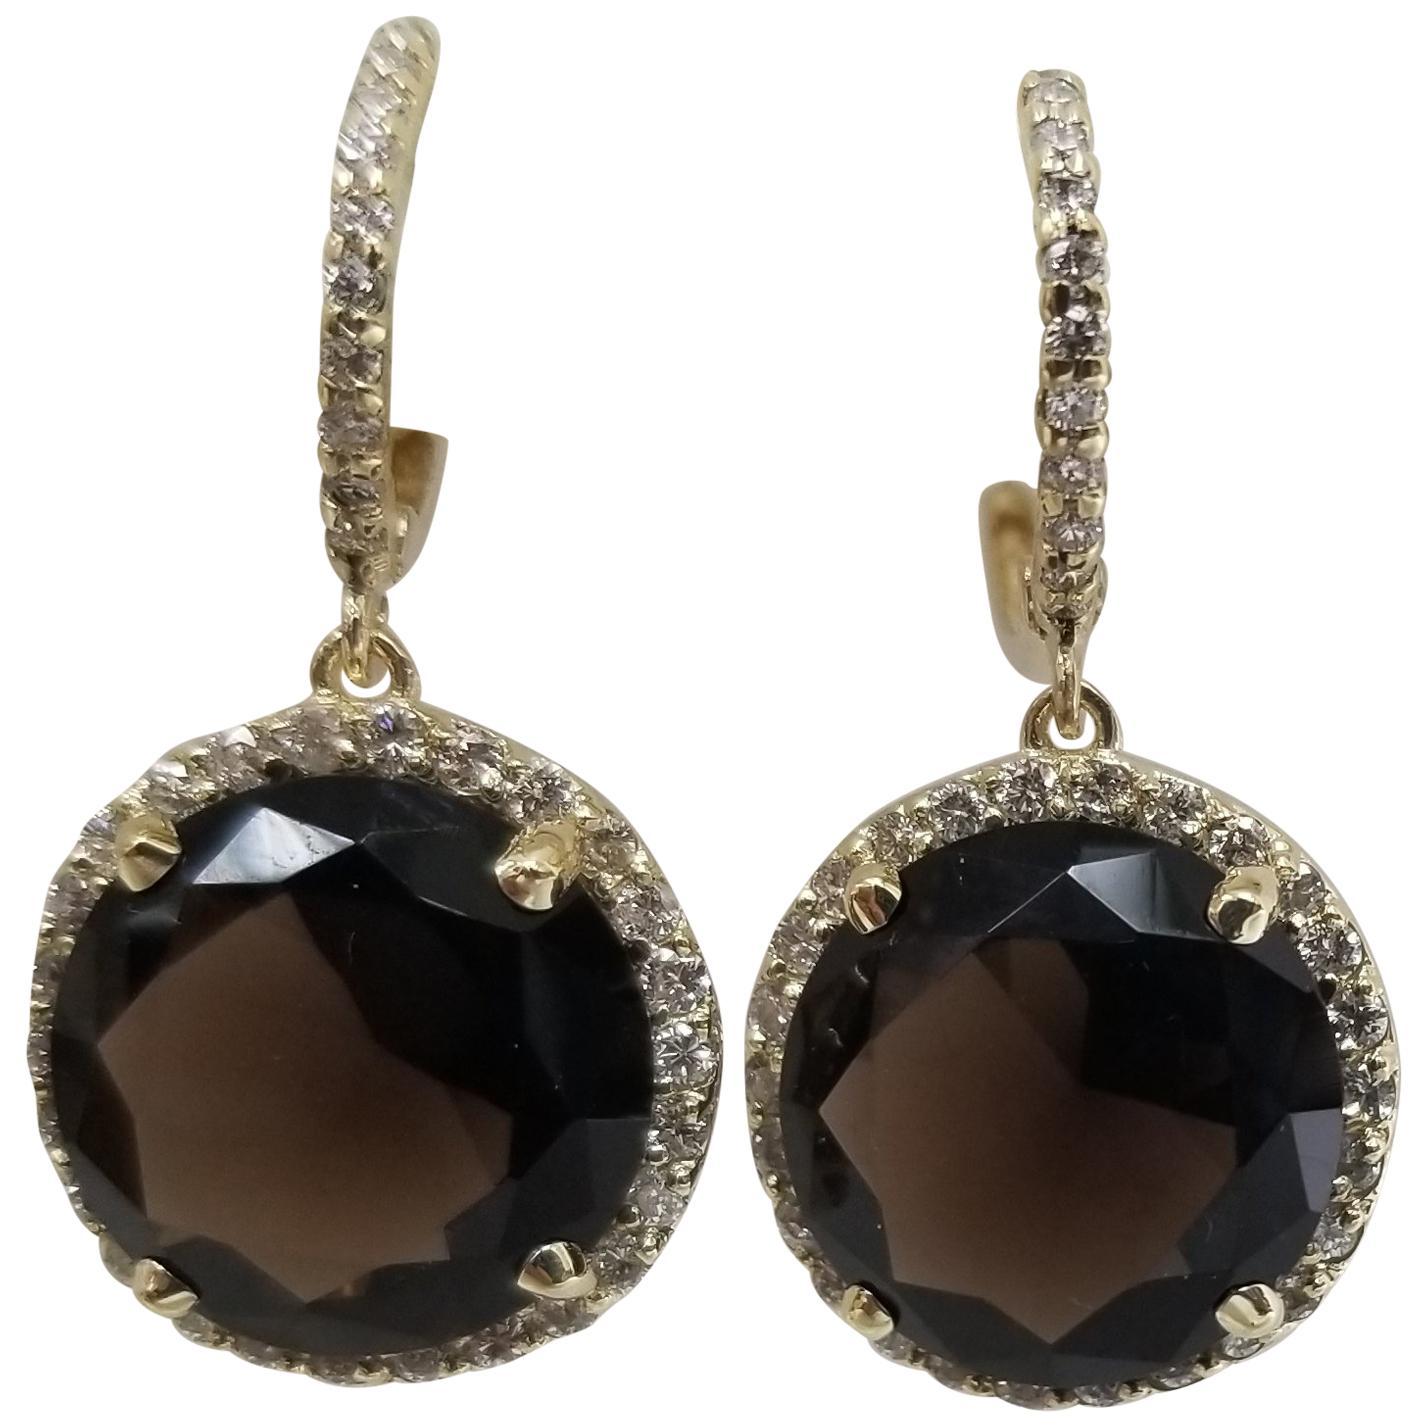 14 Karat Yellow Gold Diamond Hoop with Smokey Quartz Earrings